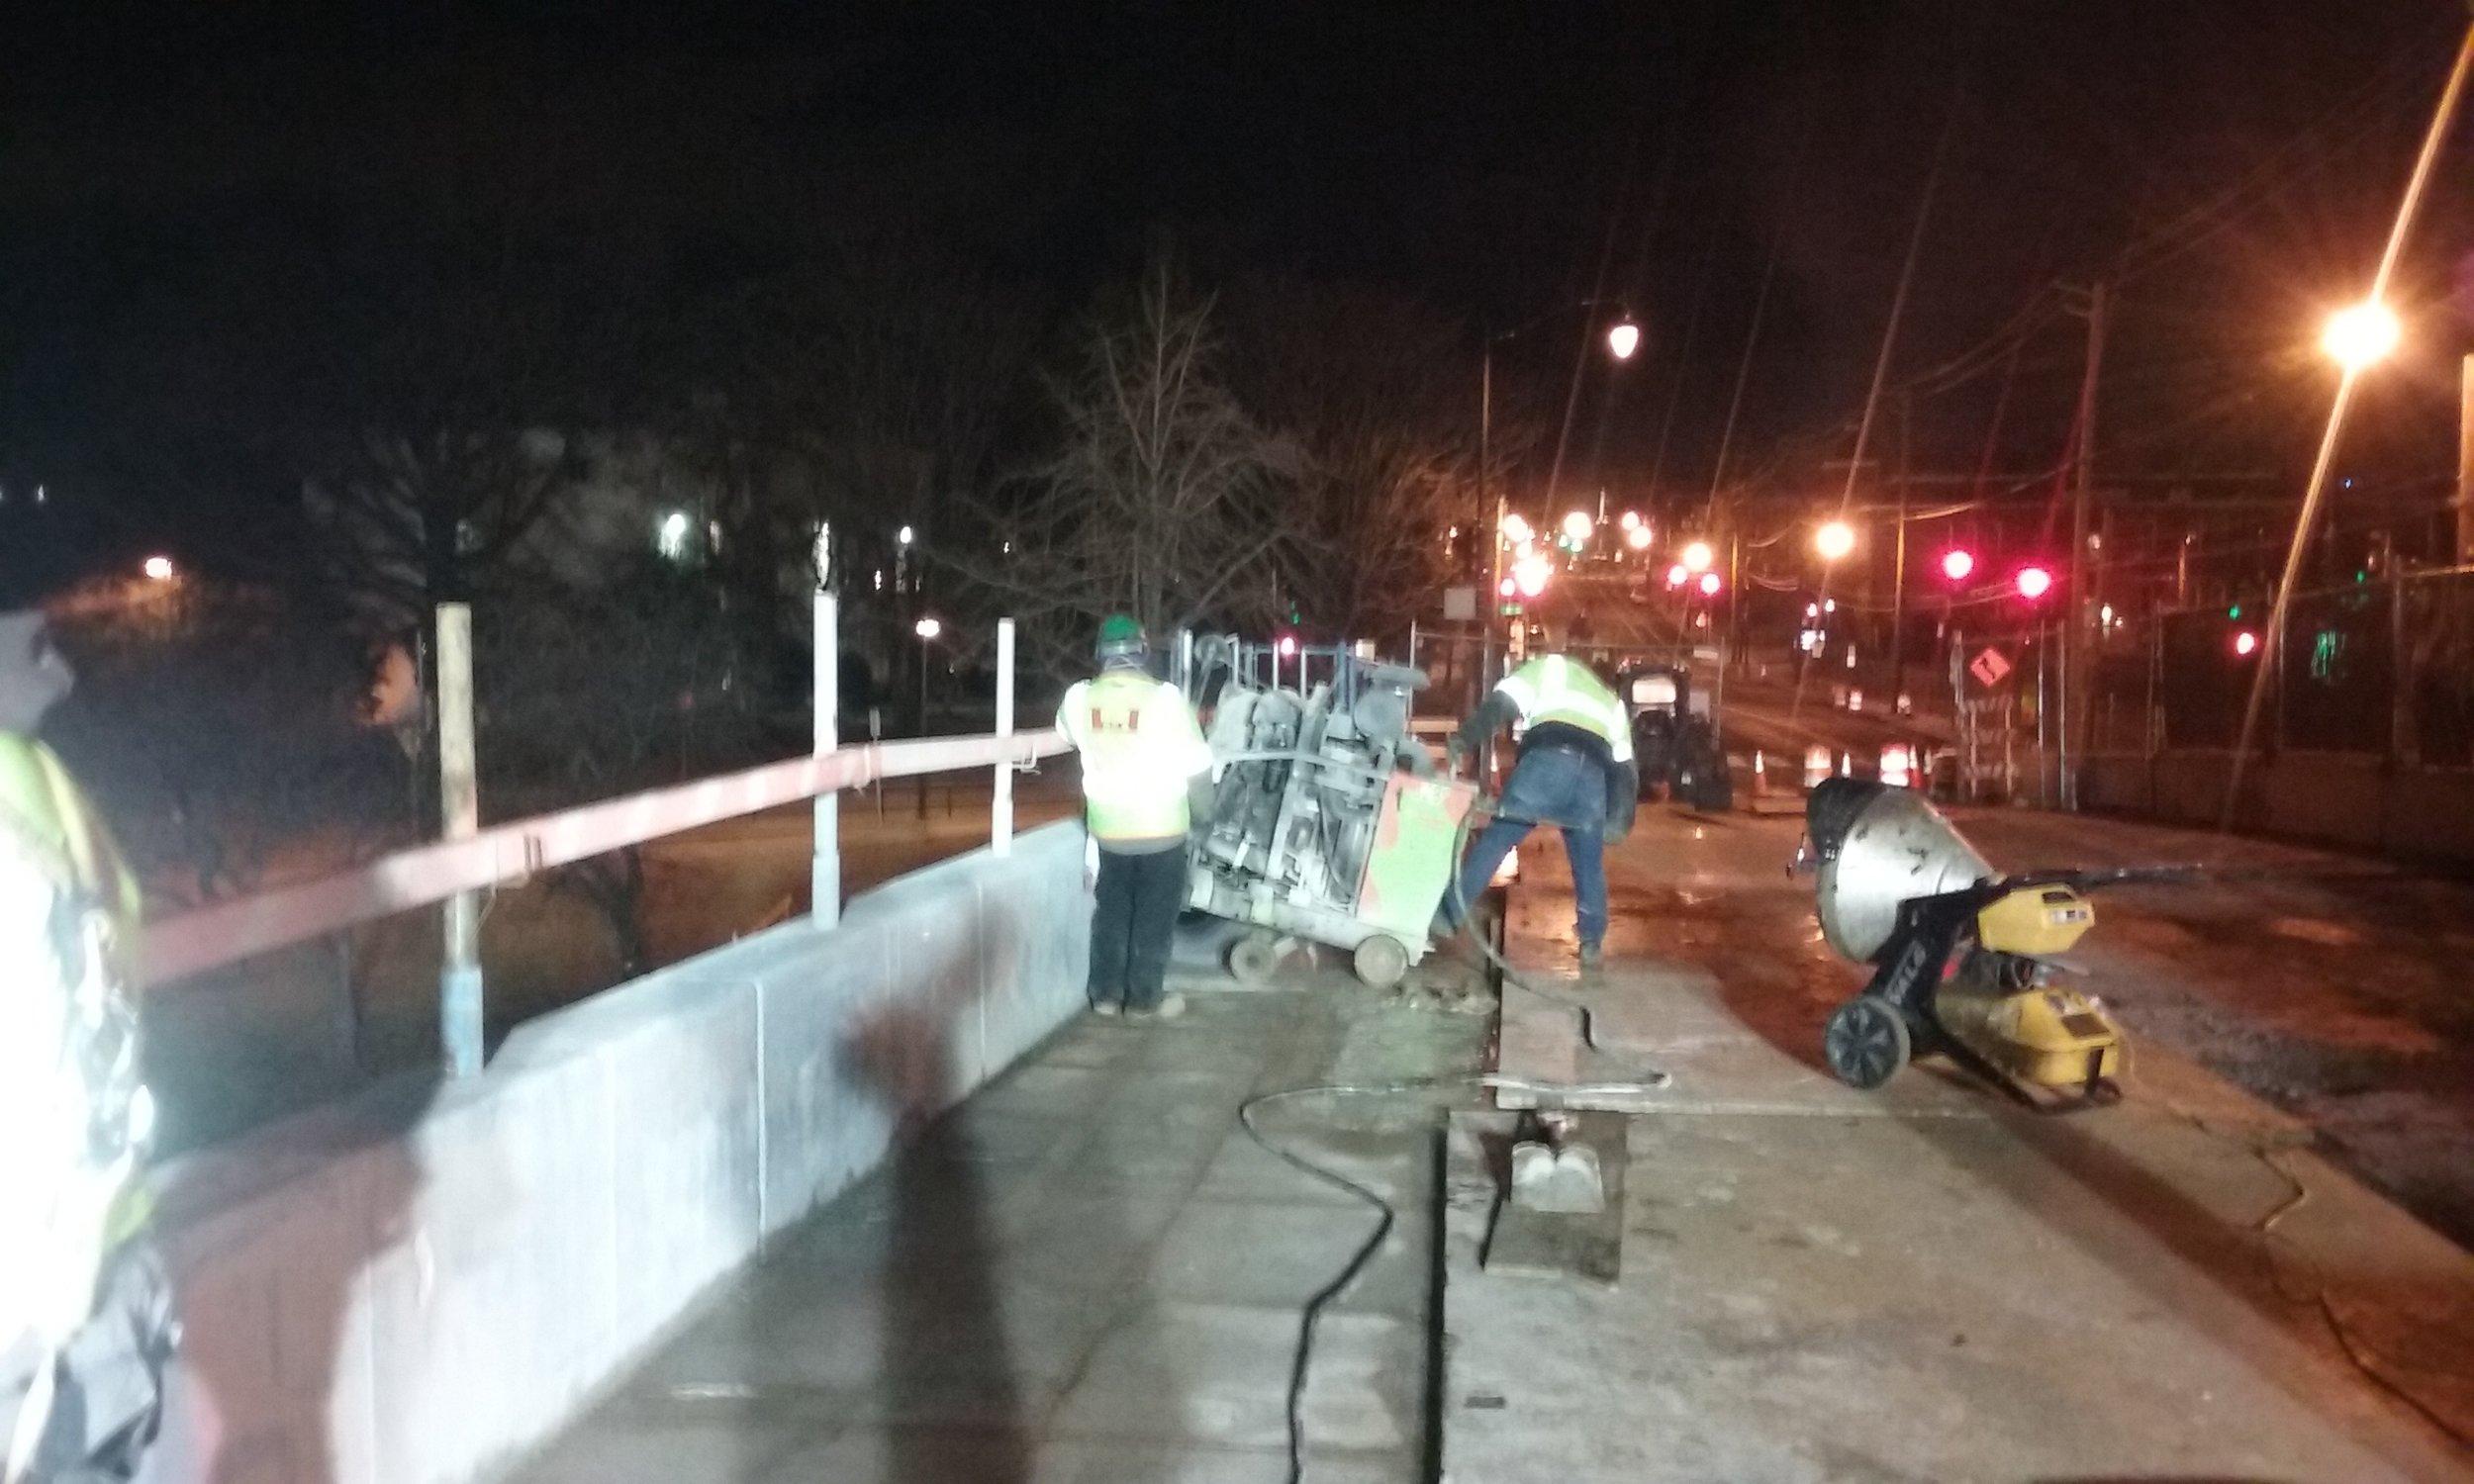 Parapet saw cutting over the bridge